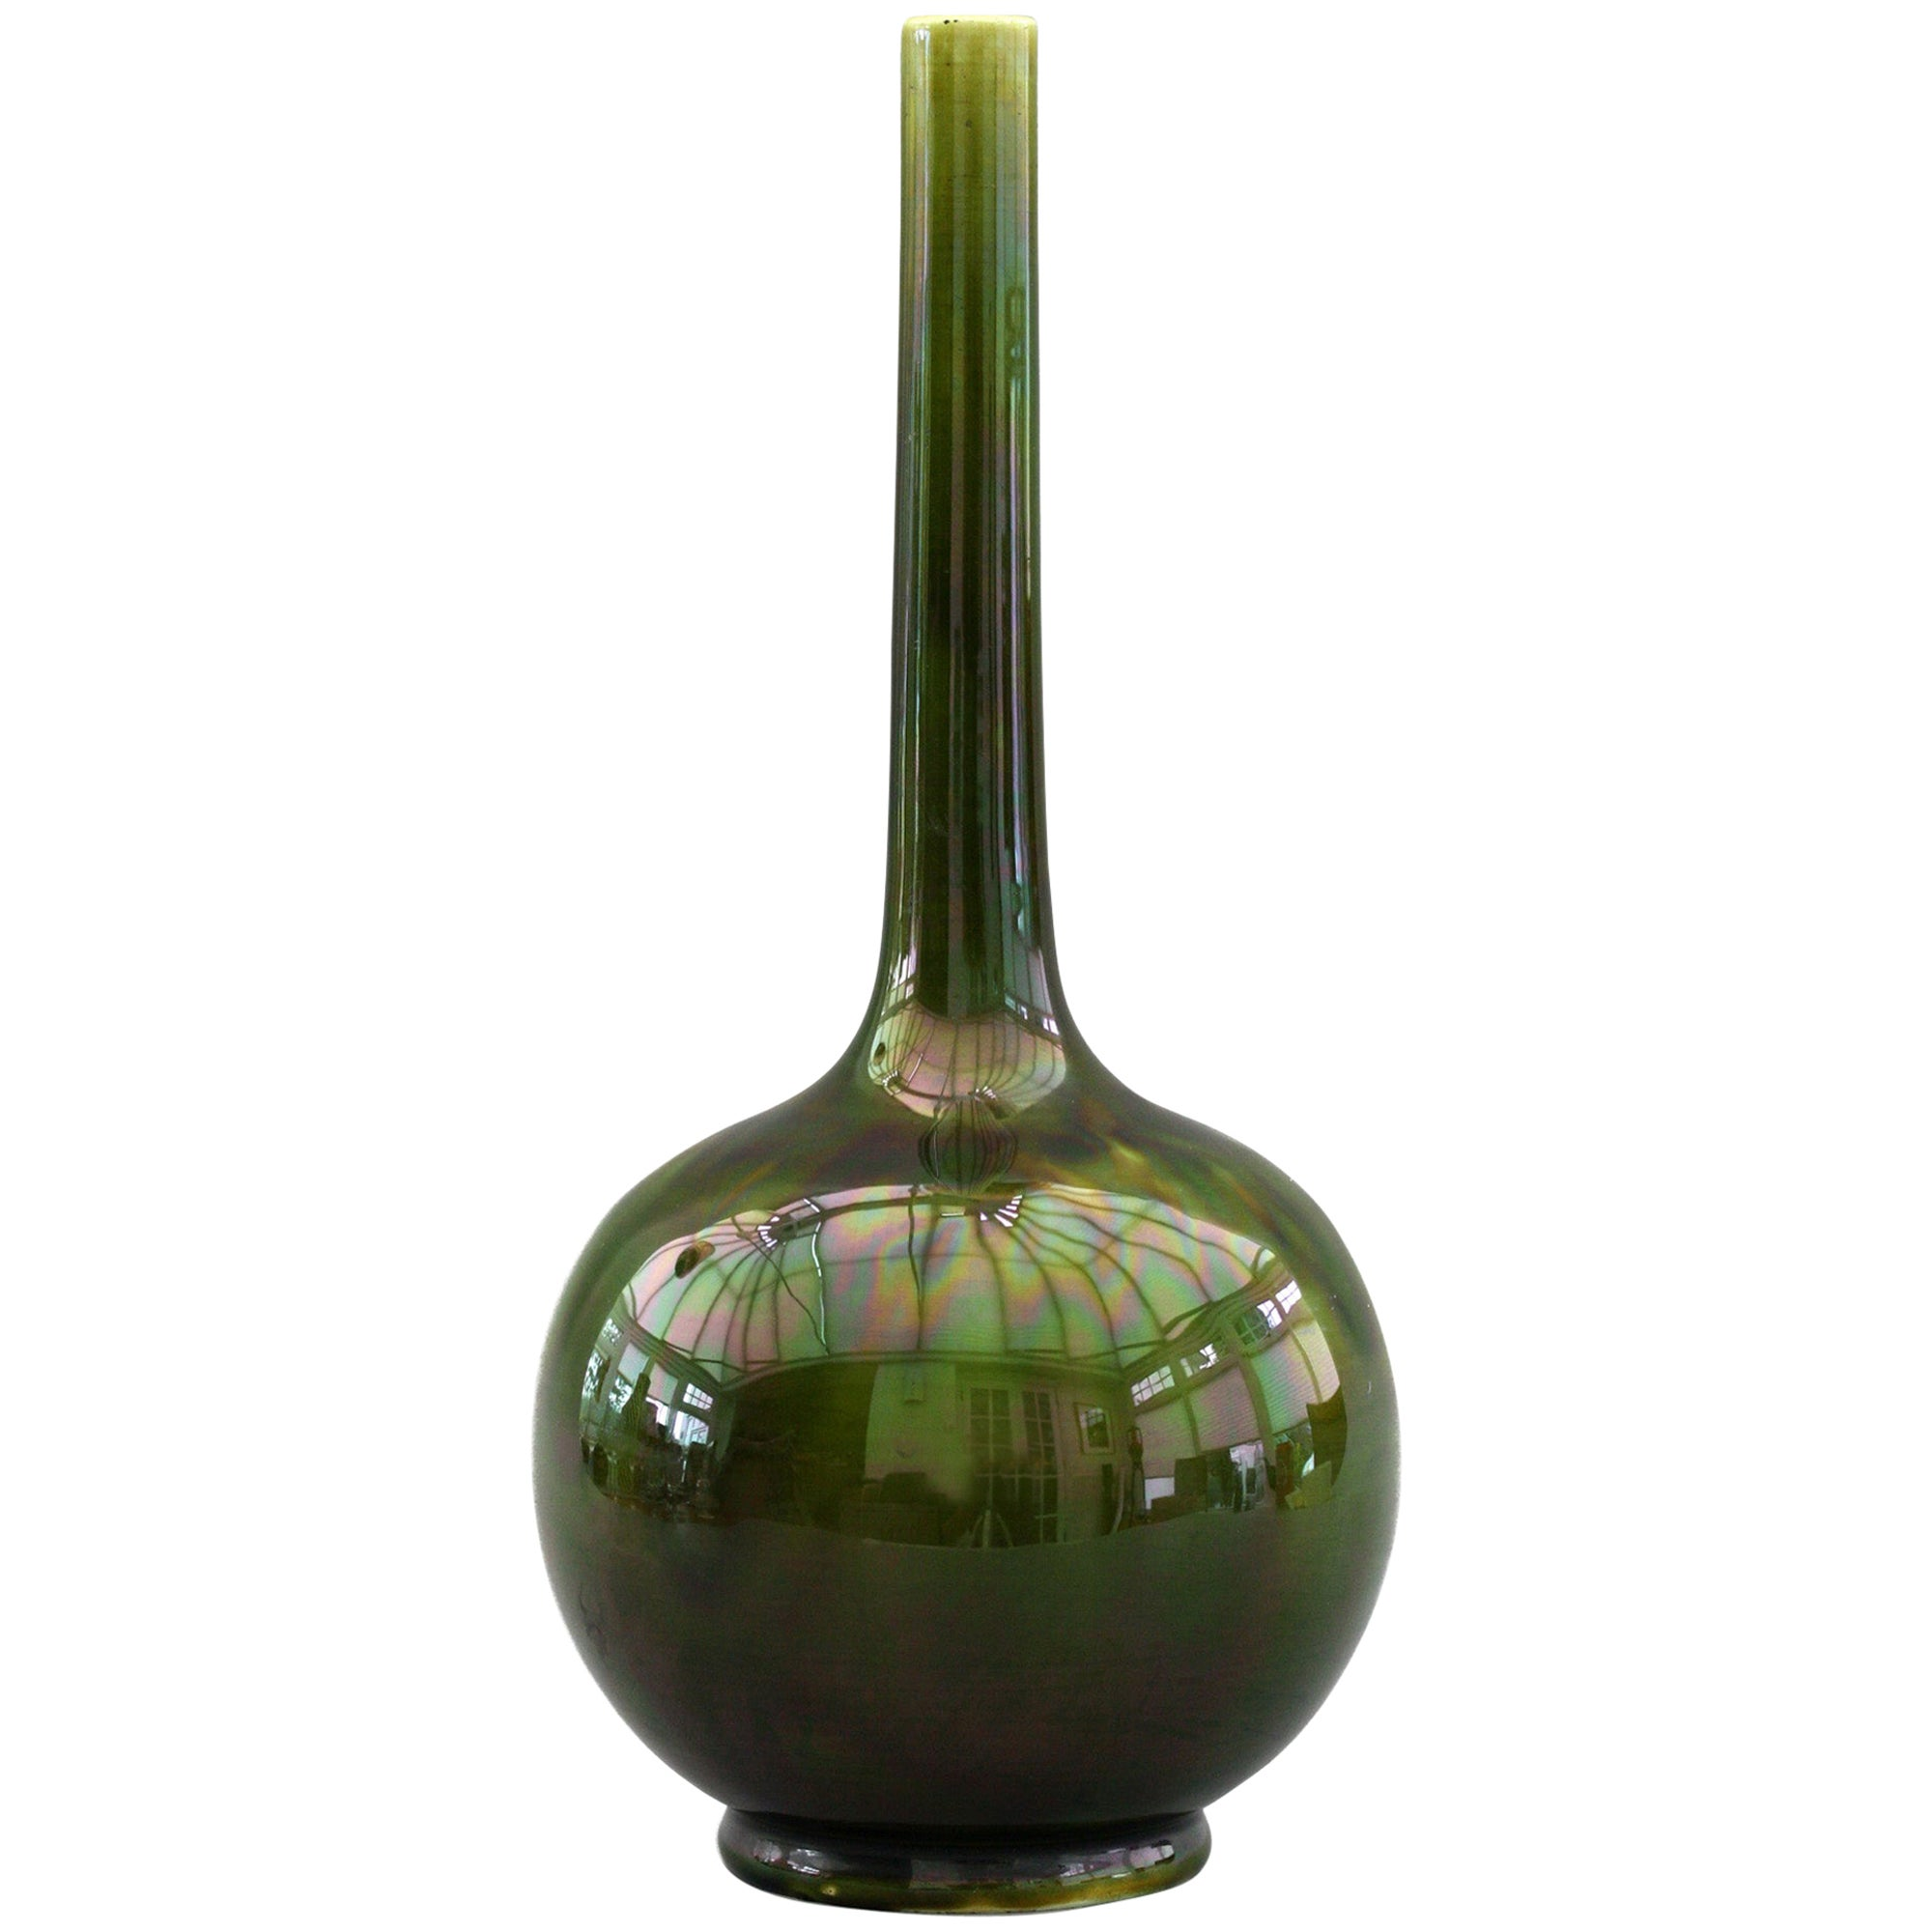 Sarreguemines Majolica Green Lustre Glazed Bottle Vase, 19th Century